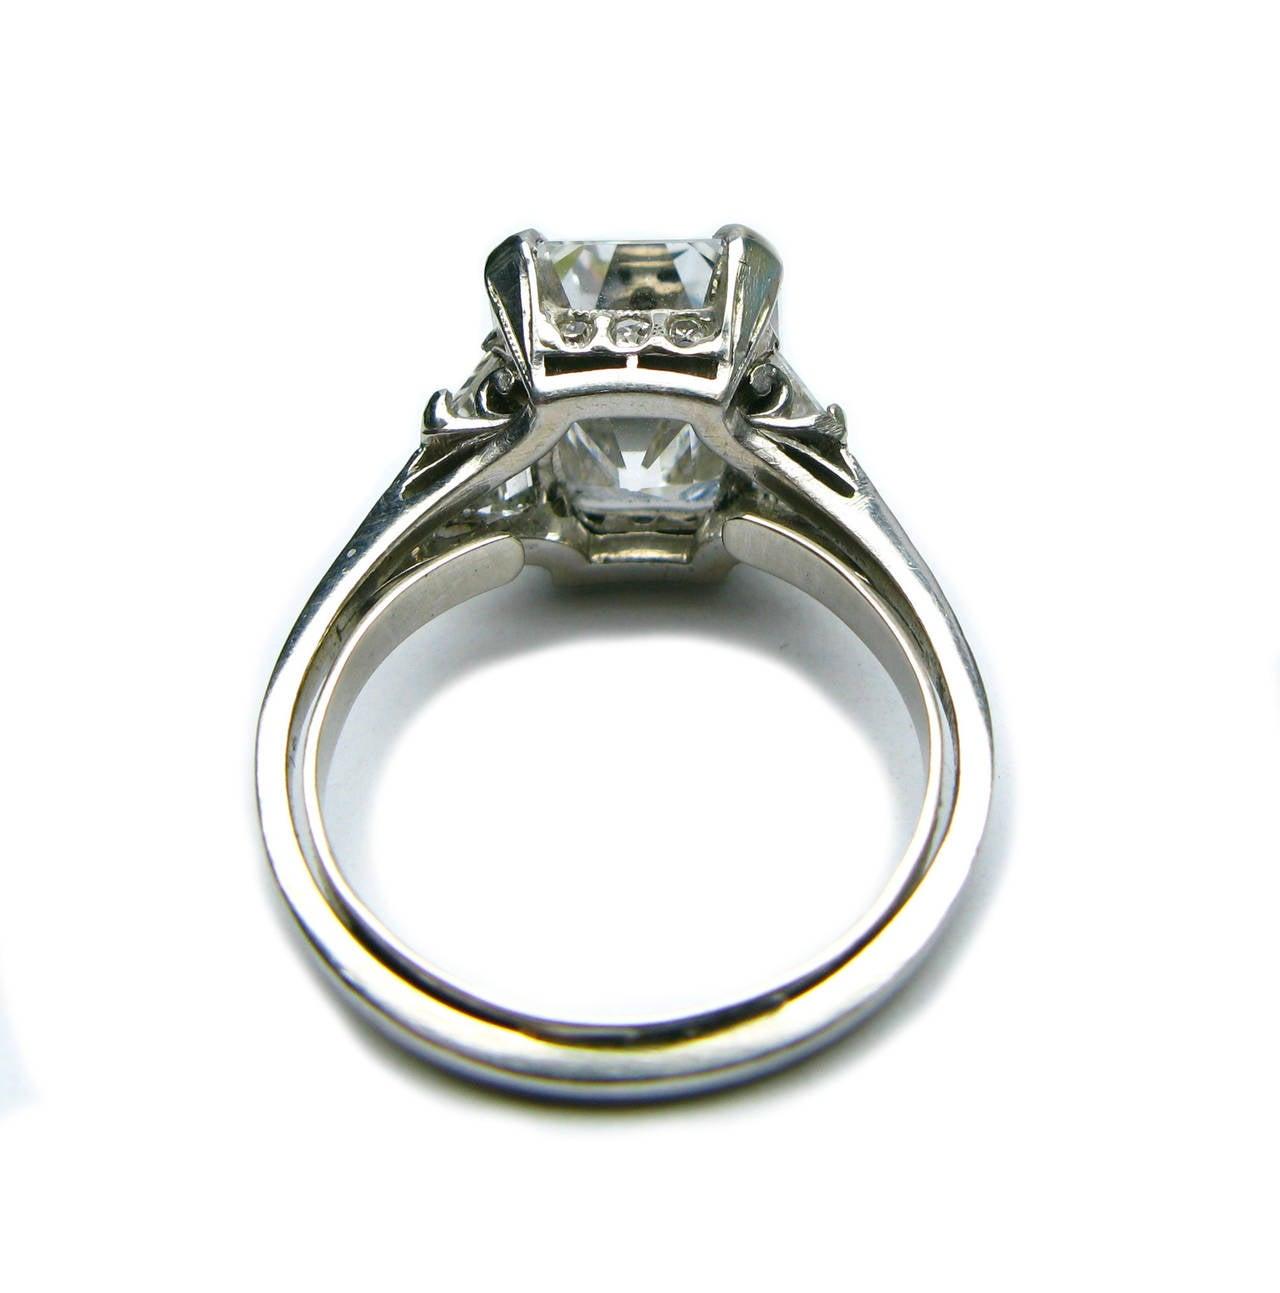 4 12 carat emerald cut deco engagement ring at 1stdibs